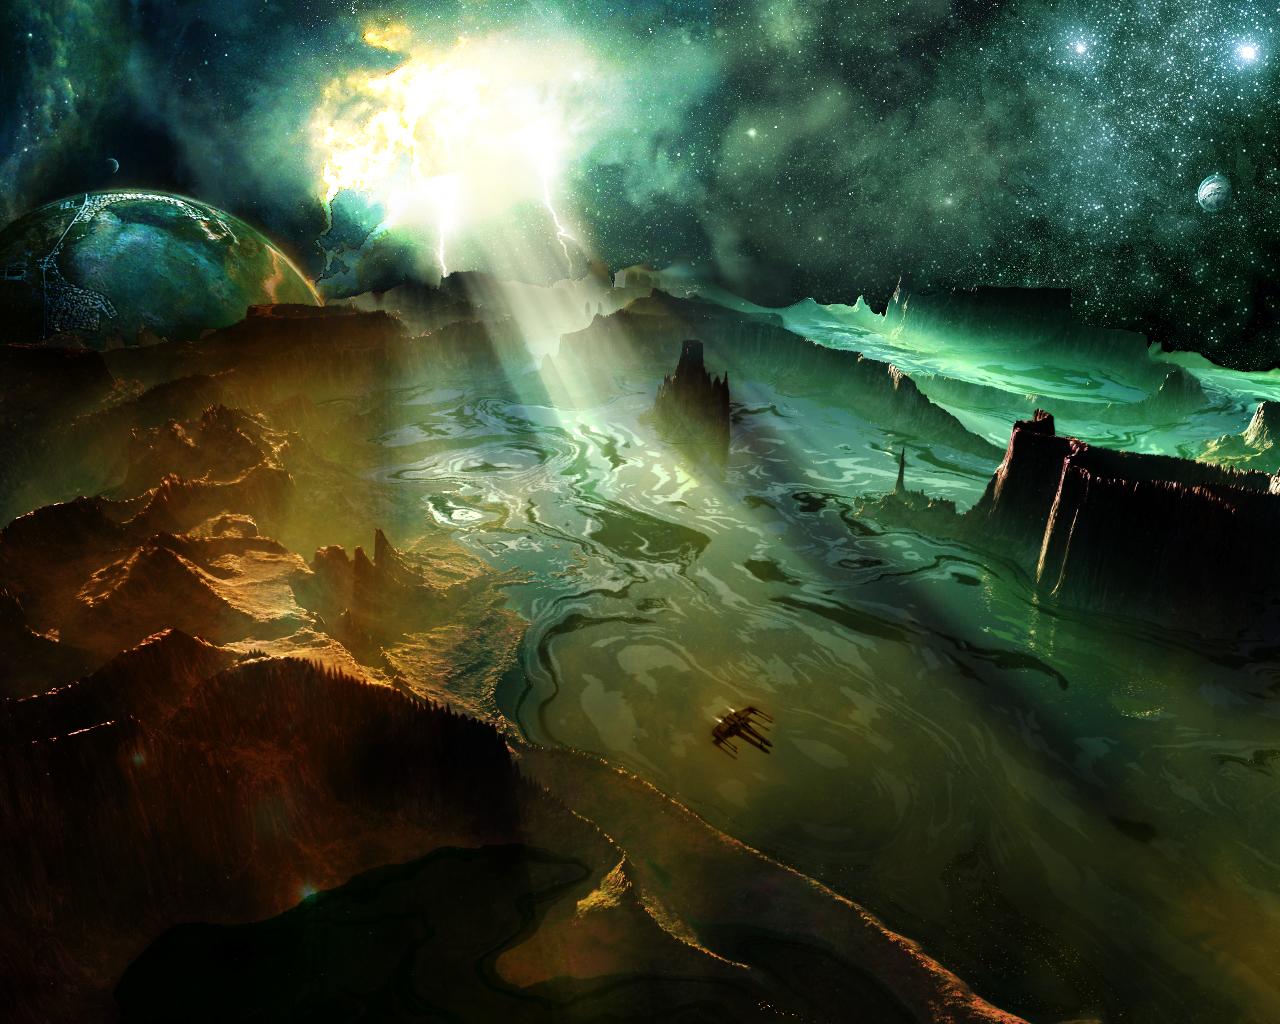 Sci fi landscape wallpaper wallpapersafari for Sci fi background